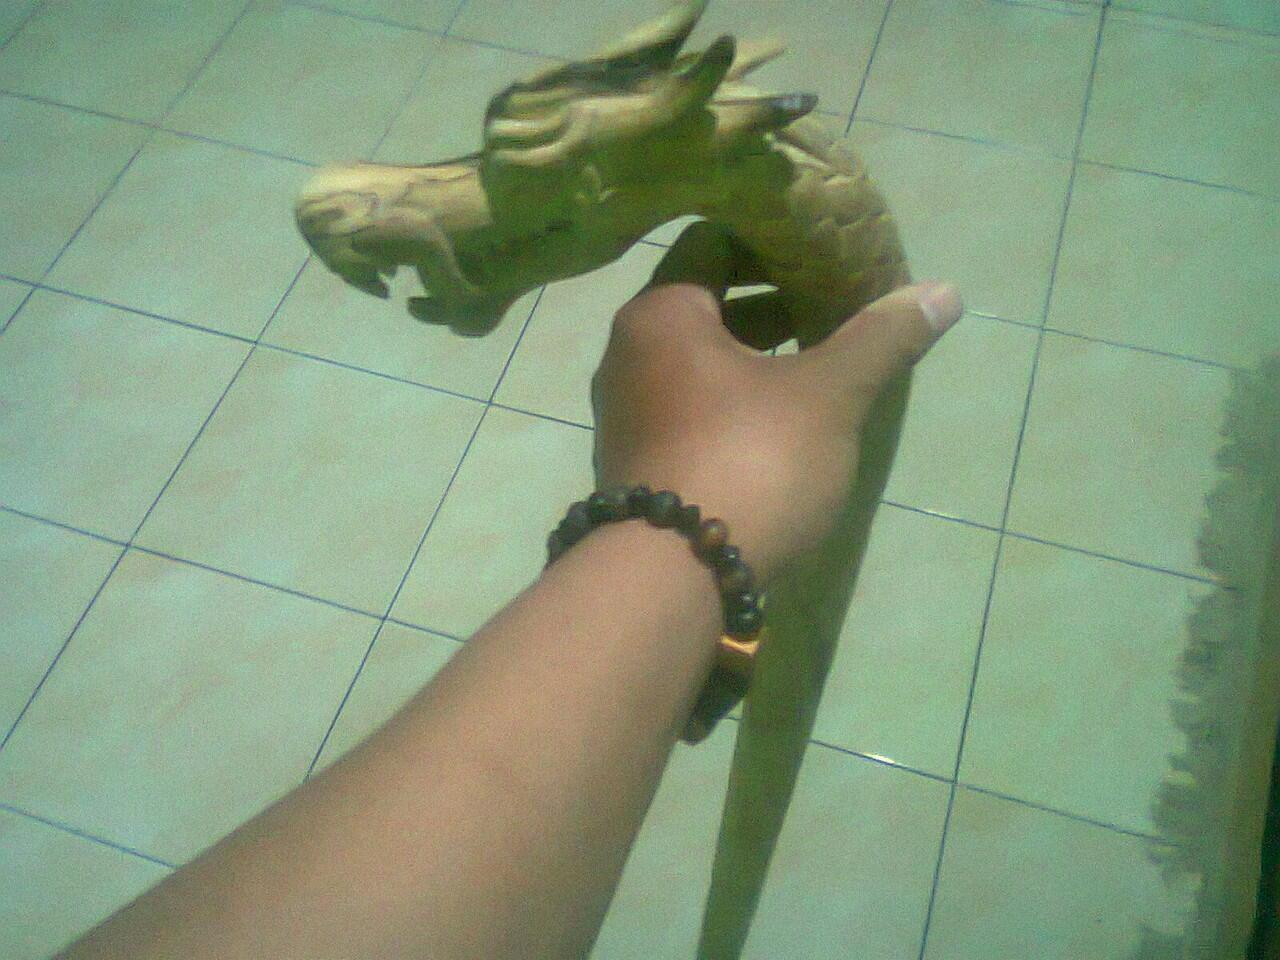 tongkat naga kayu timoho pellet sampir